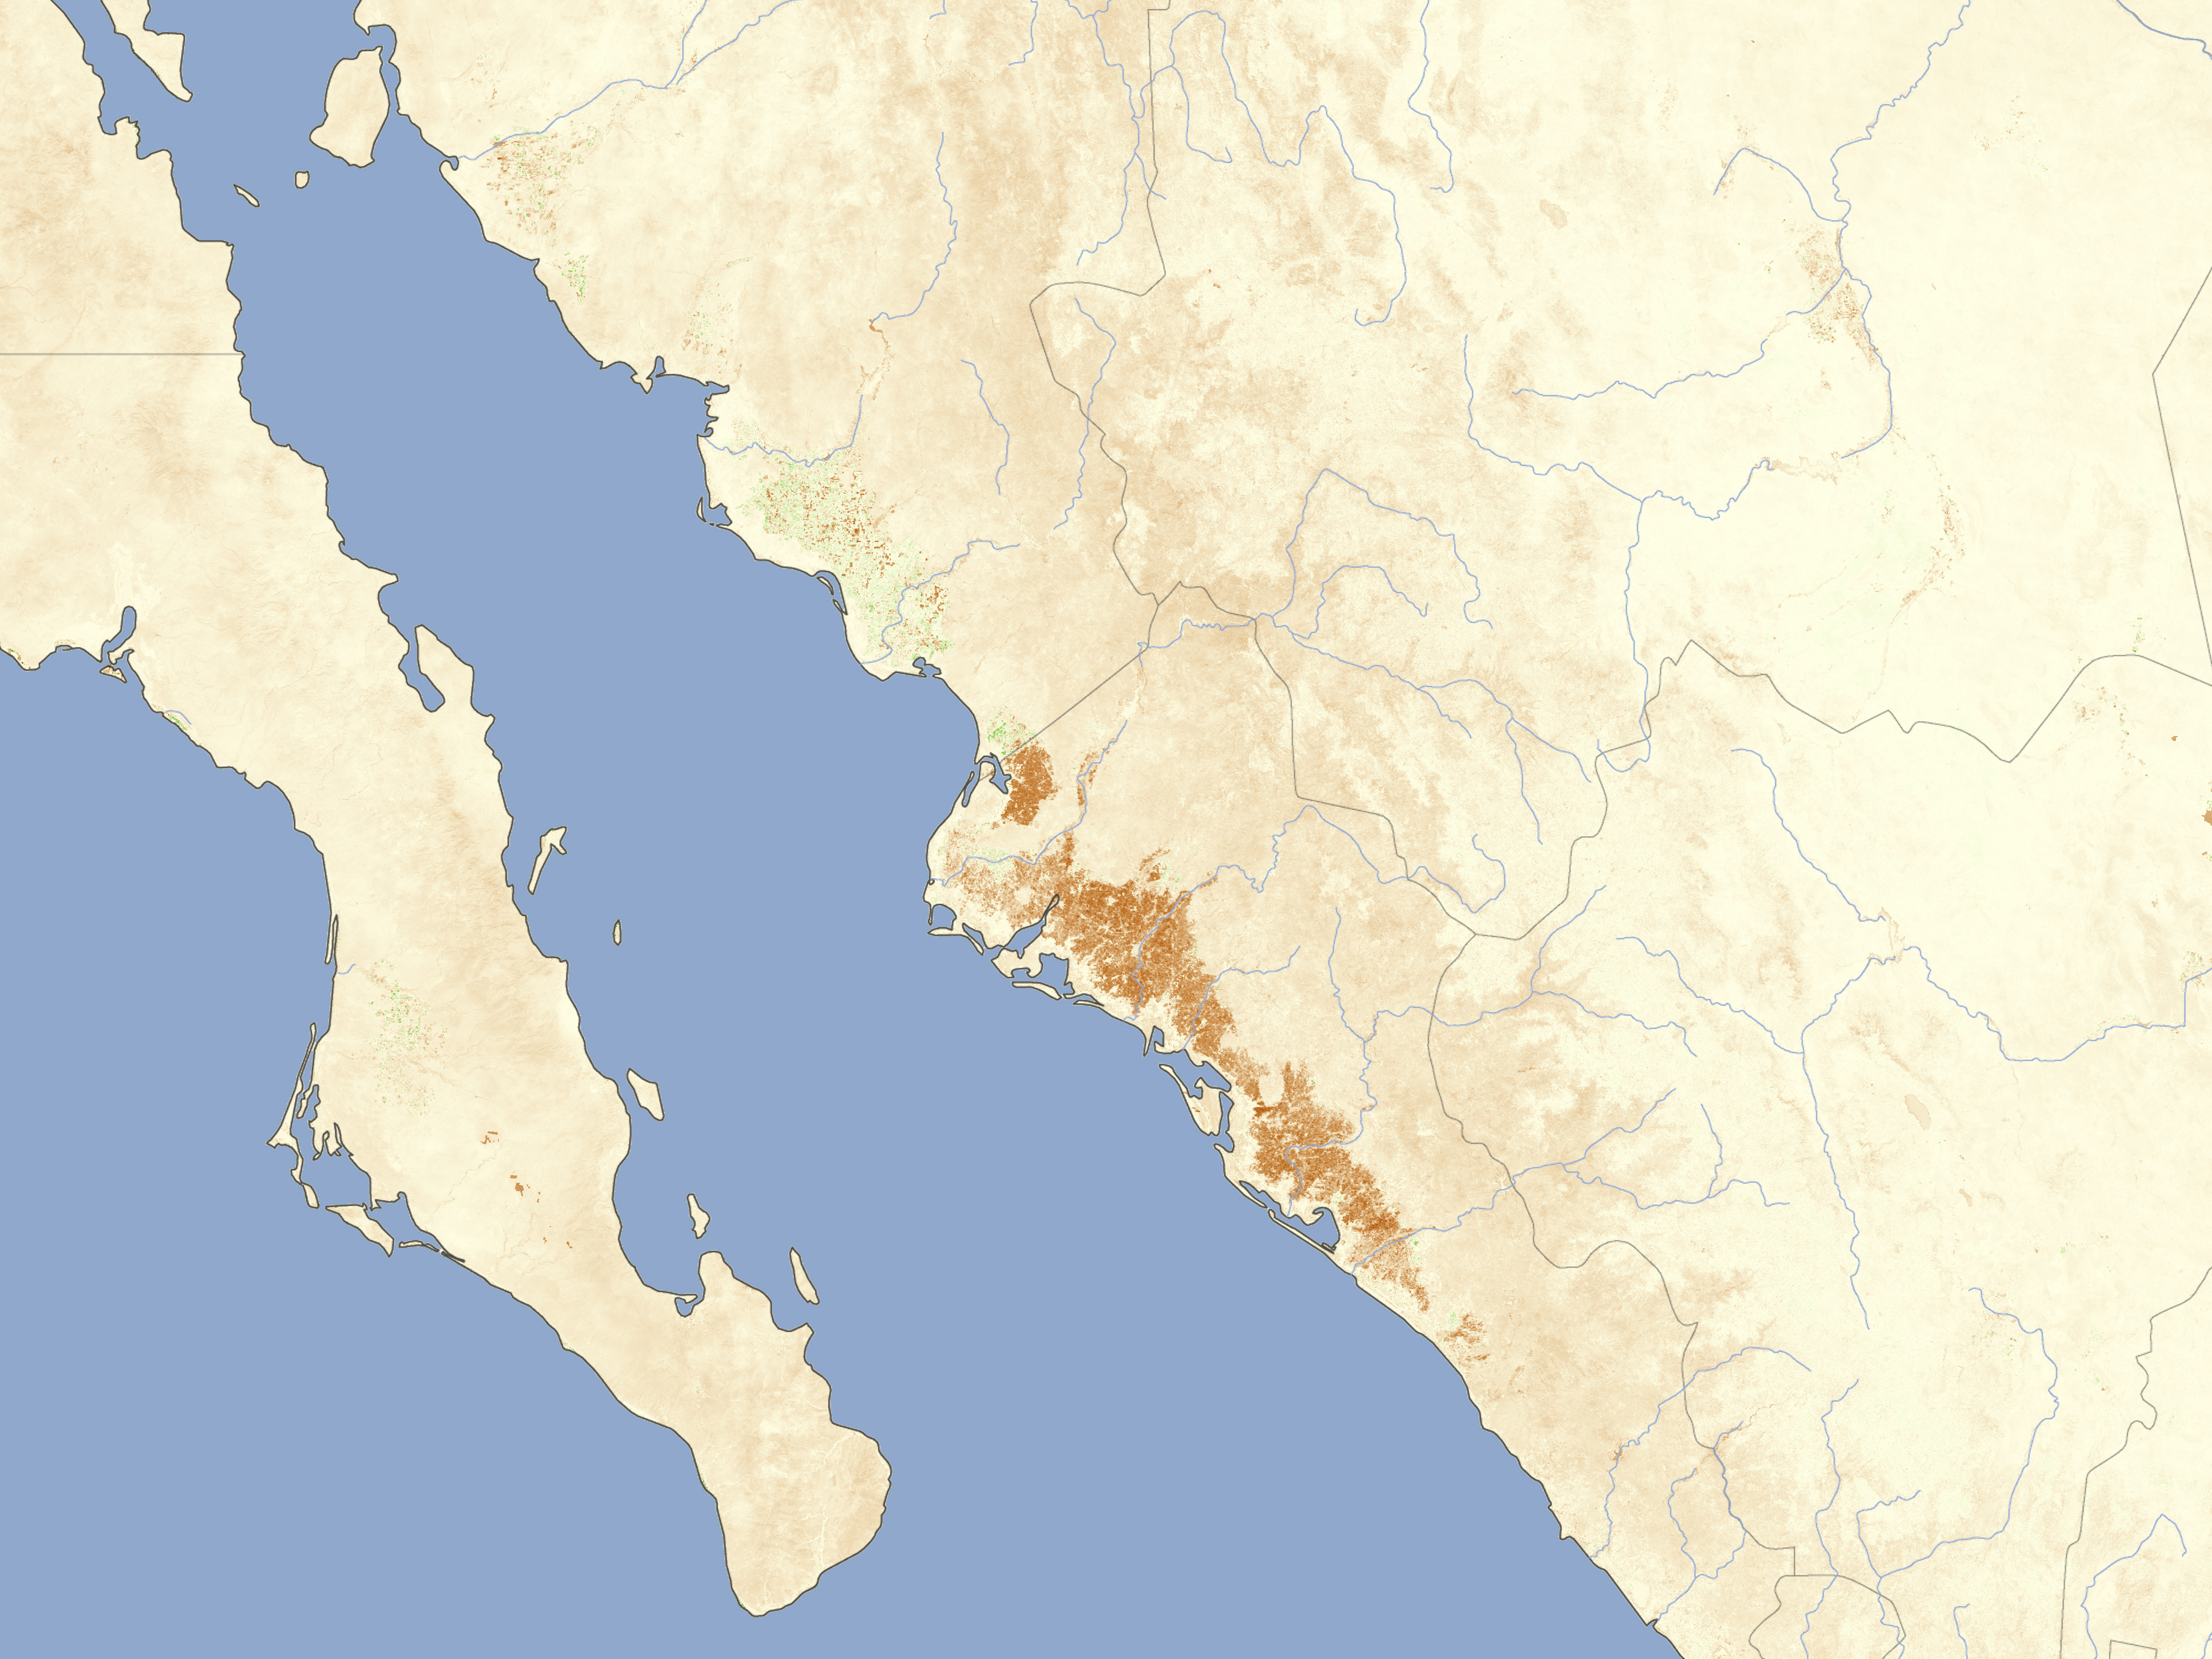 Cold Weather Damages Crops in Sinaloa, Mexico on badiraguato map, tabasco map, mexico map, zacatecas map, pitiquito map, tamaulipas map, durango map, fuerte river map, zambezia map, morelos map, hidalgo map, aguascalientes map, nueva esparta map, nayarit map, culiacan map, tlaxcala map, michoacan map, guanajuato map, jalisco map, norte map,